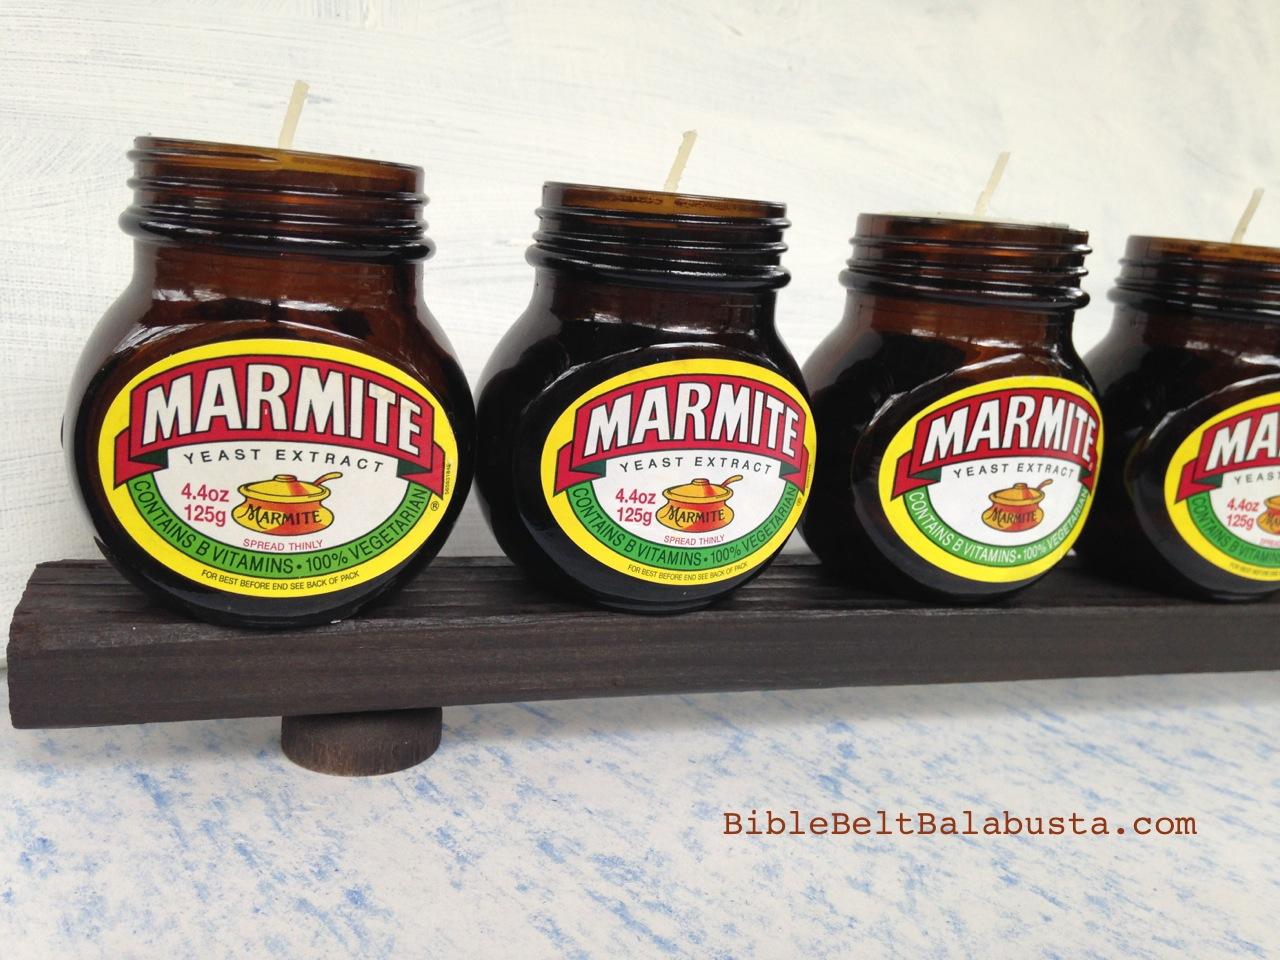 Marmite menorah bible belt balabusta